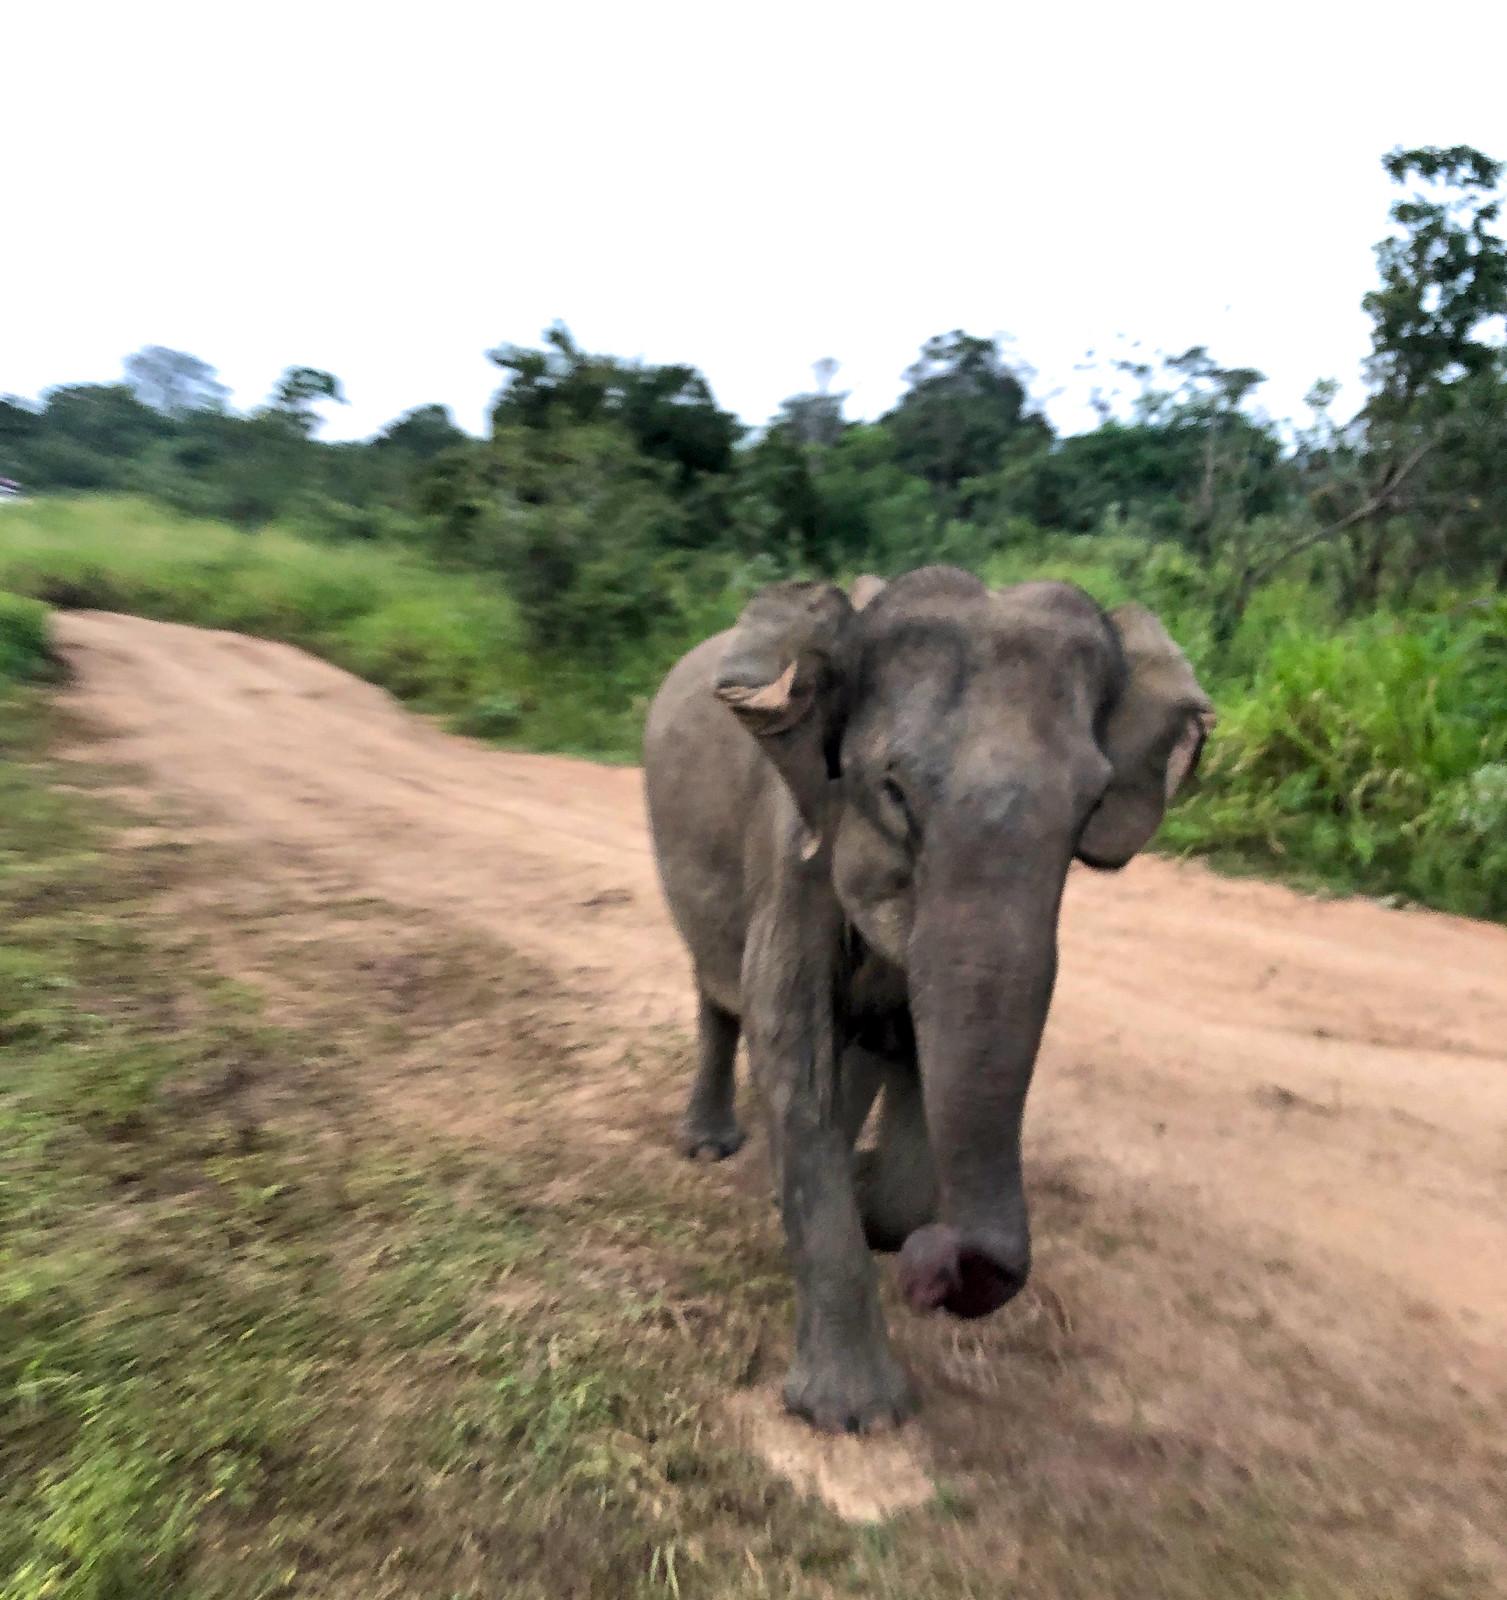 VER ELEFANTES SALVAJES EN SRI LANKA ver elefantes salvajes en sri lanka - 46249634644 a903c6096b h - Ver elefantes salvajes en Sri Lanka